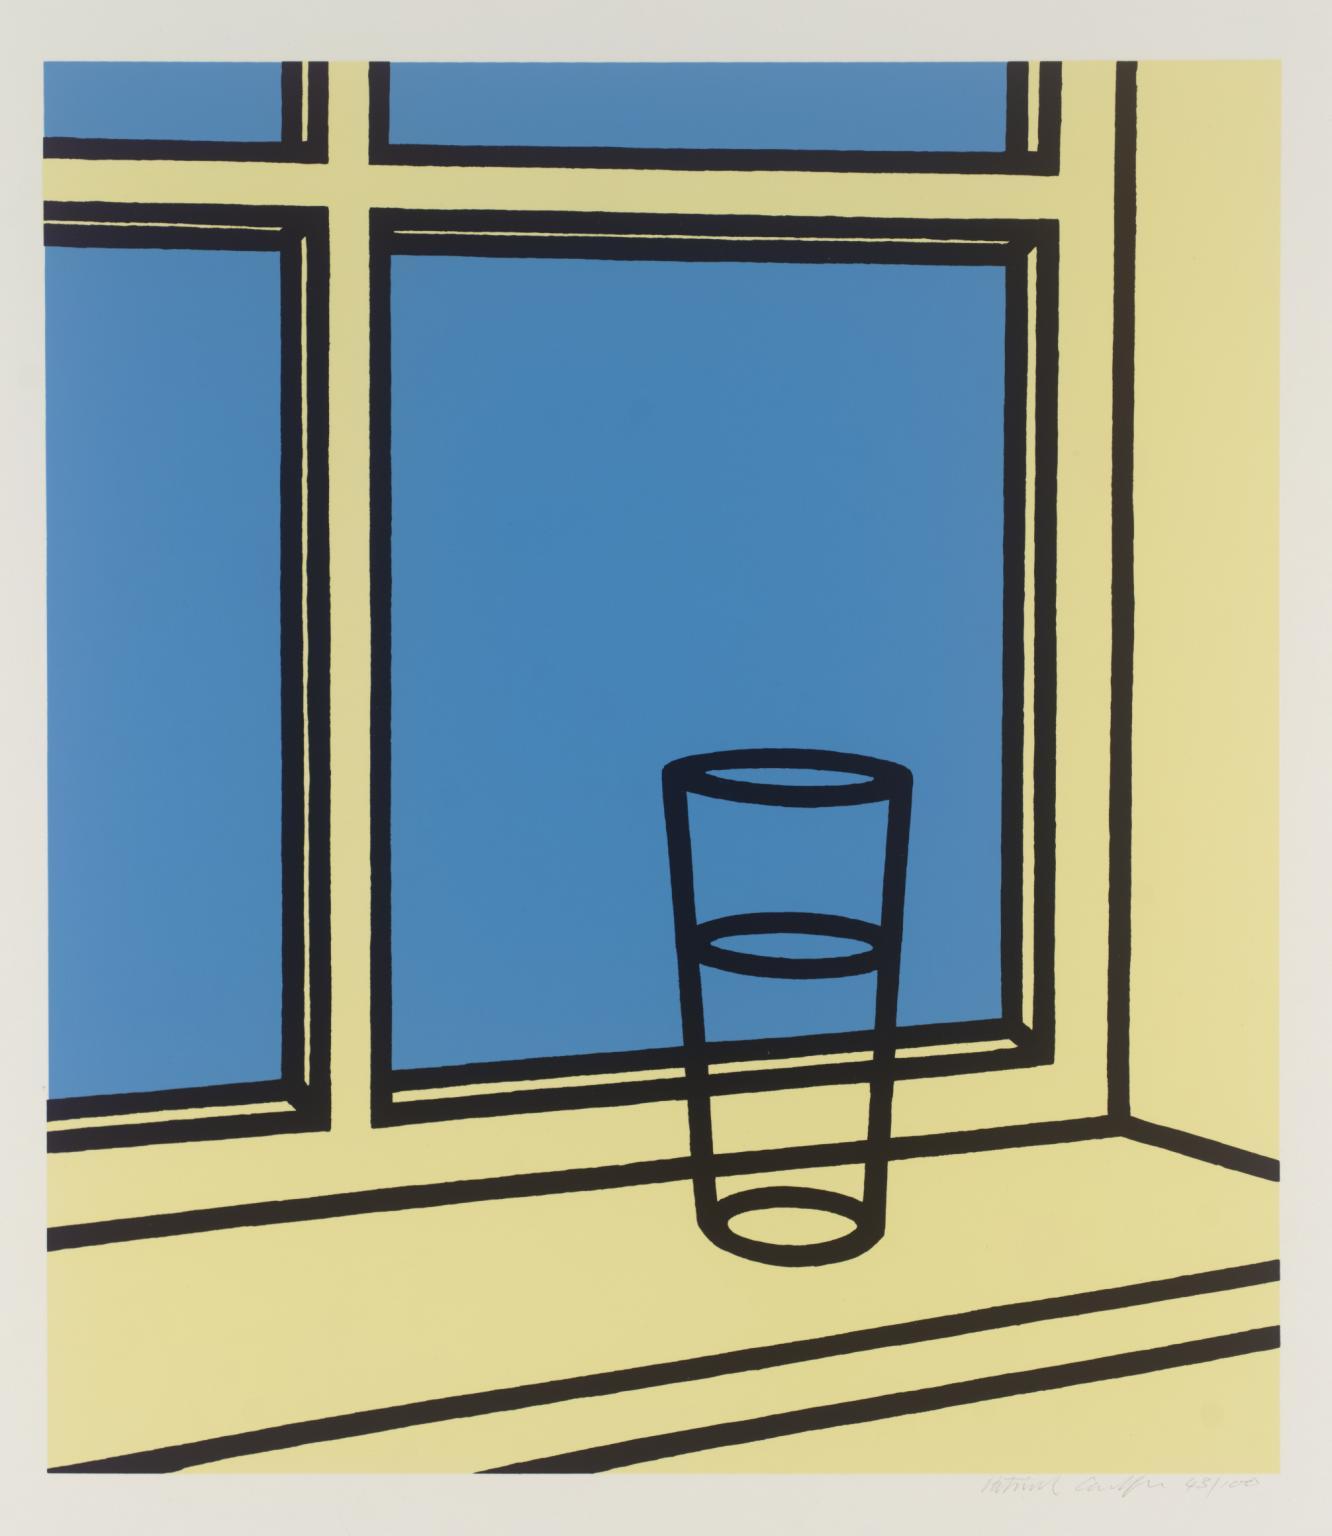 Patrick Caulfield, Oh Helen, I Roam my Room (1973) © the artist